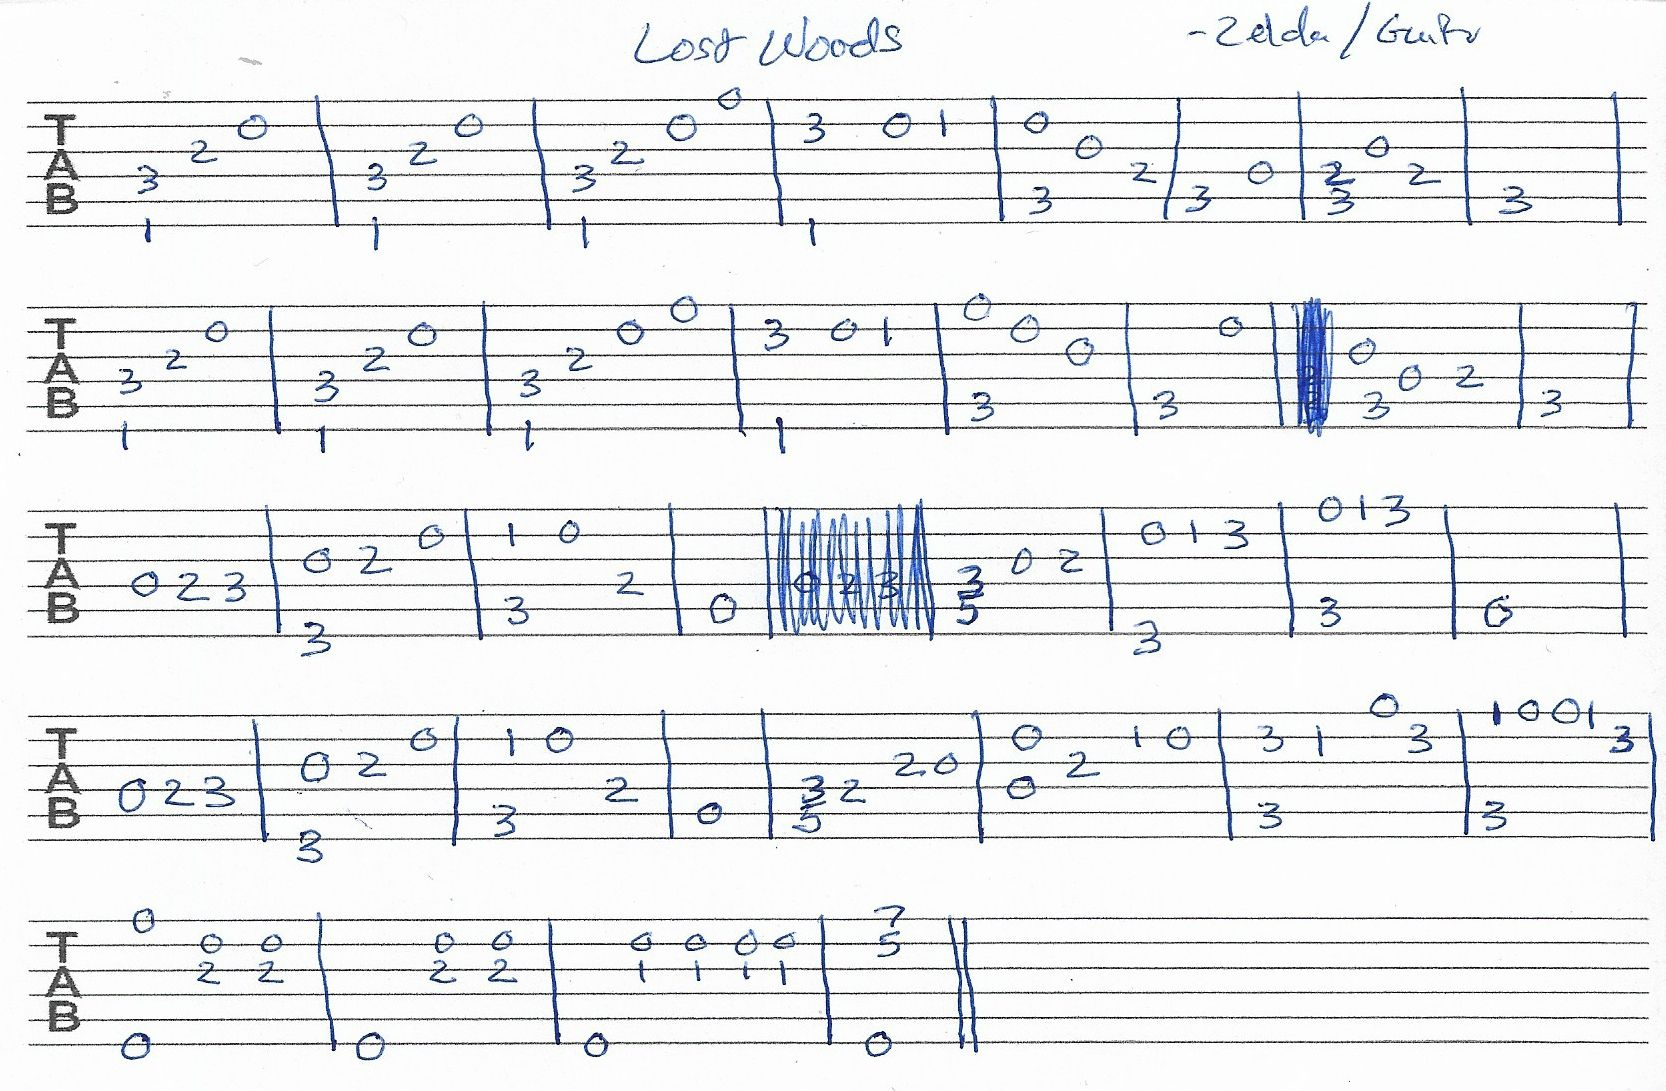 Lost Woods Zelda Guitar Tab Guitar Tabs Guitar Tabs Songs Guitar Sheet Music